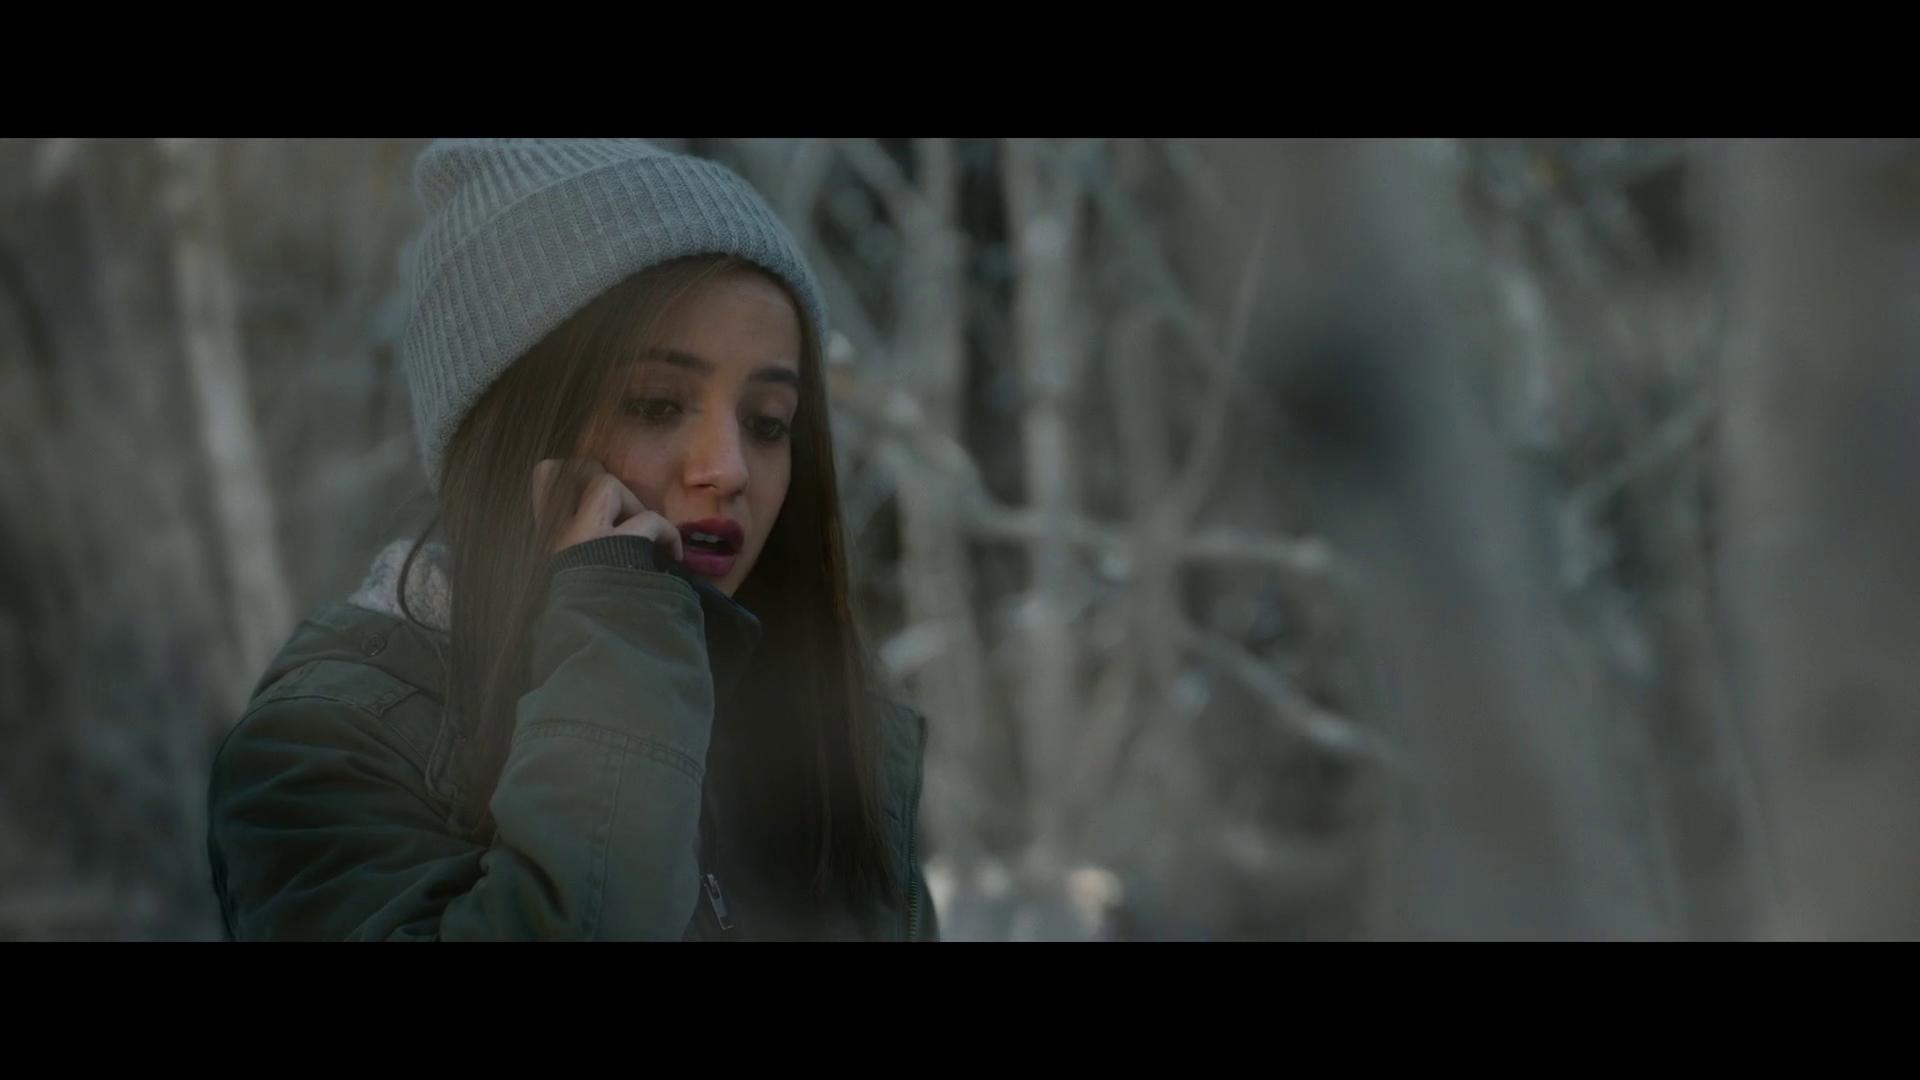 Tatlı Kız - Sweet Girl (2021) 1080p NF WEB-DL DDP5.1 Atmos H.264 DUAL [TR EN]